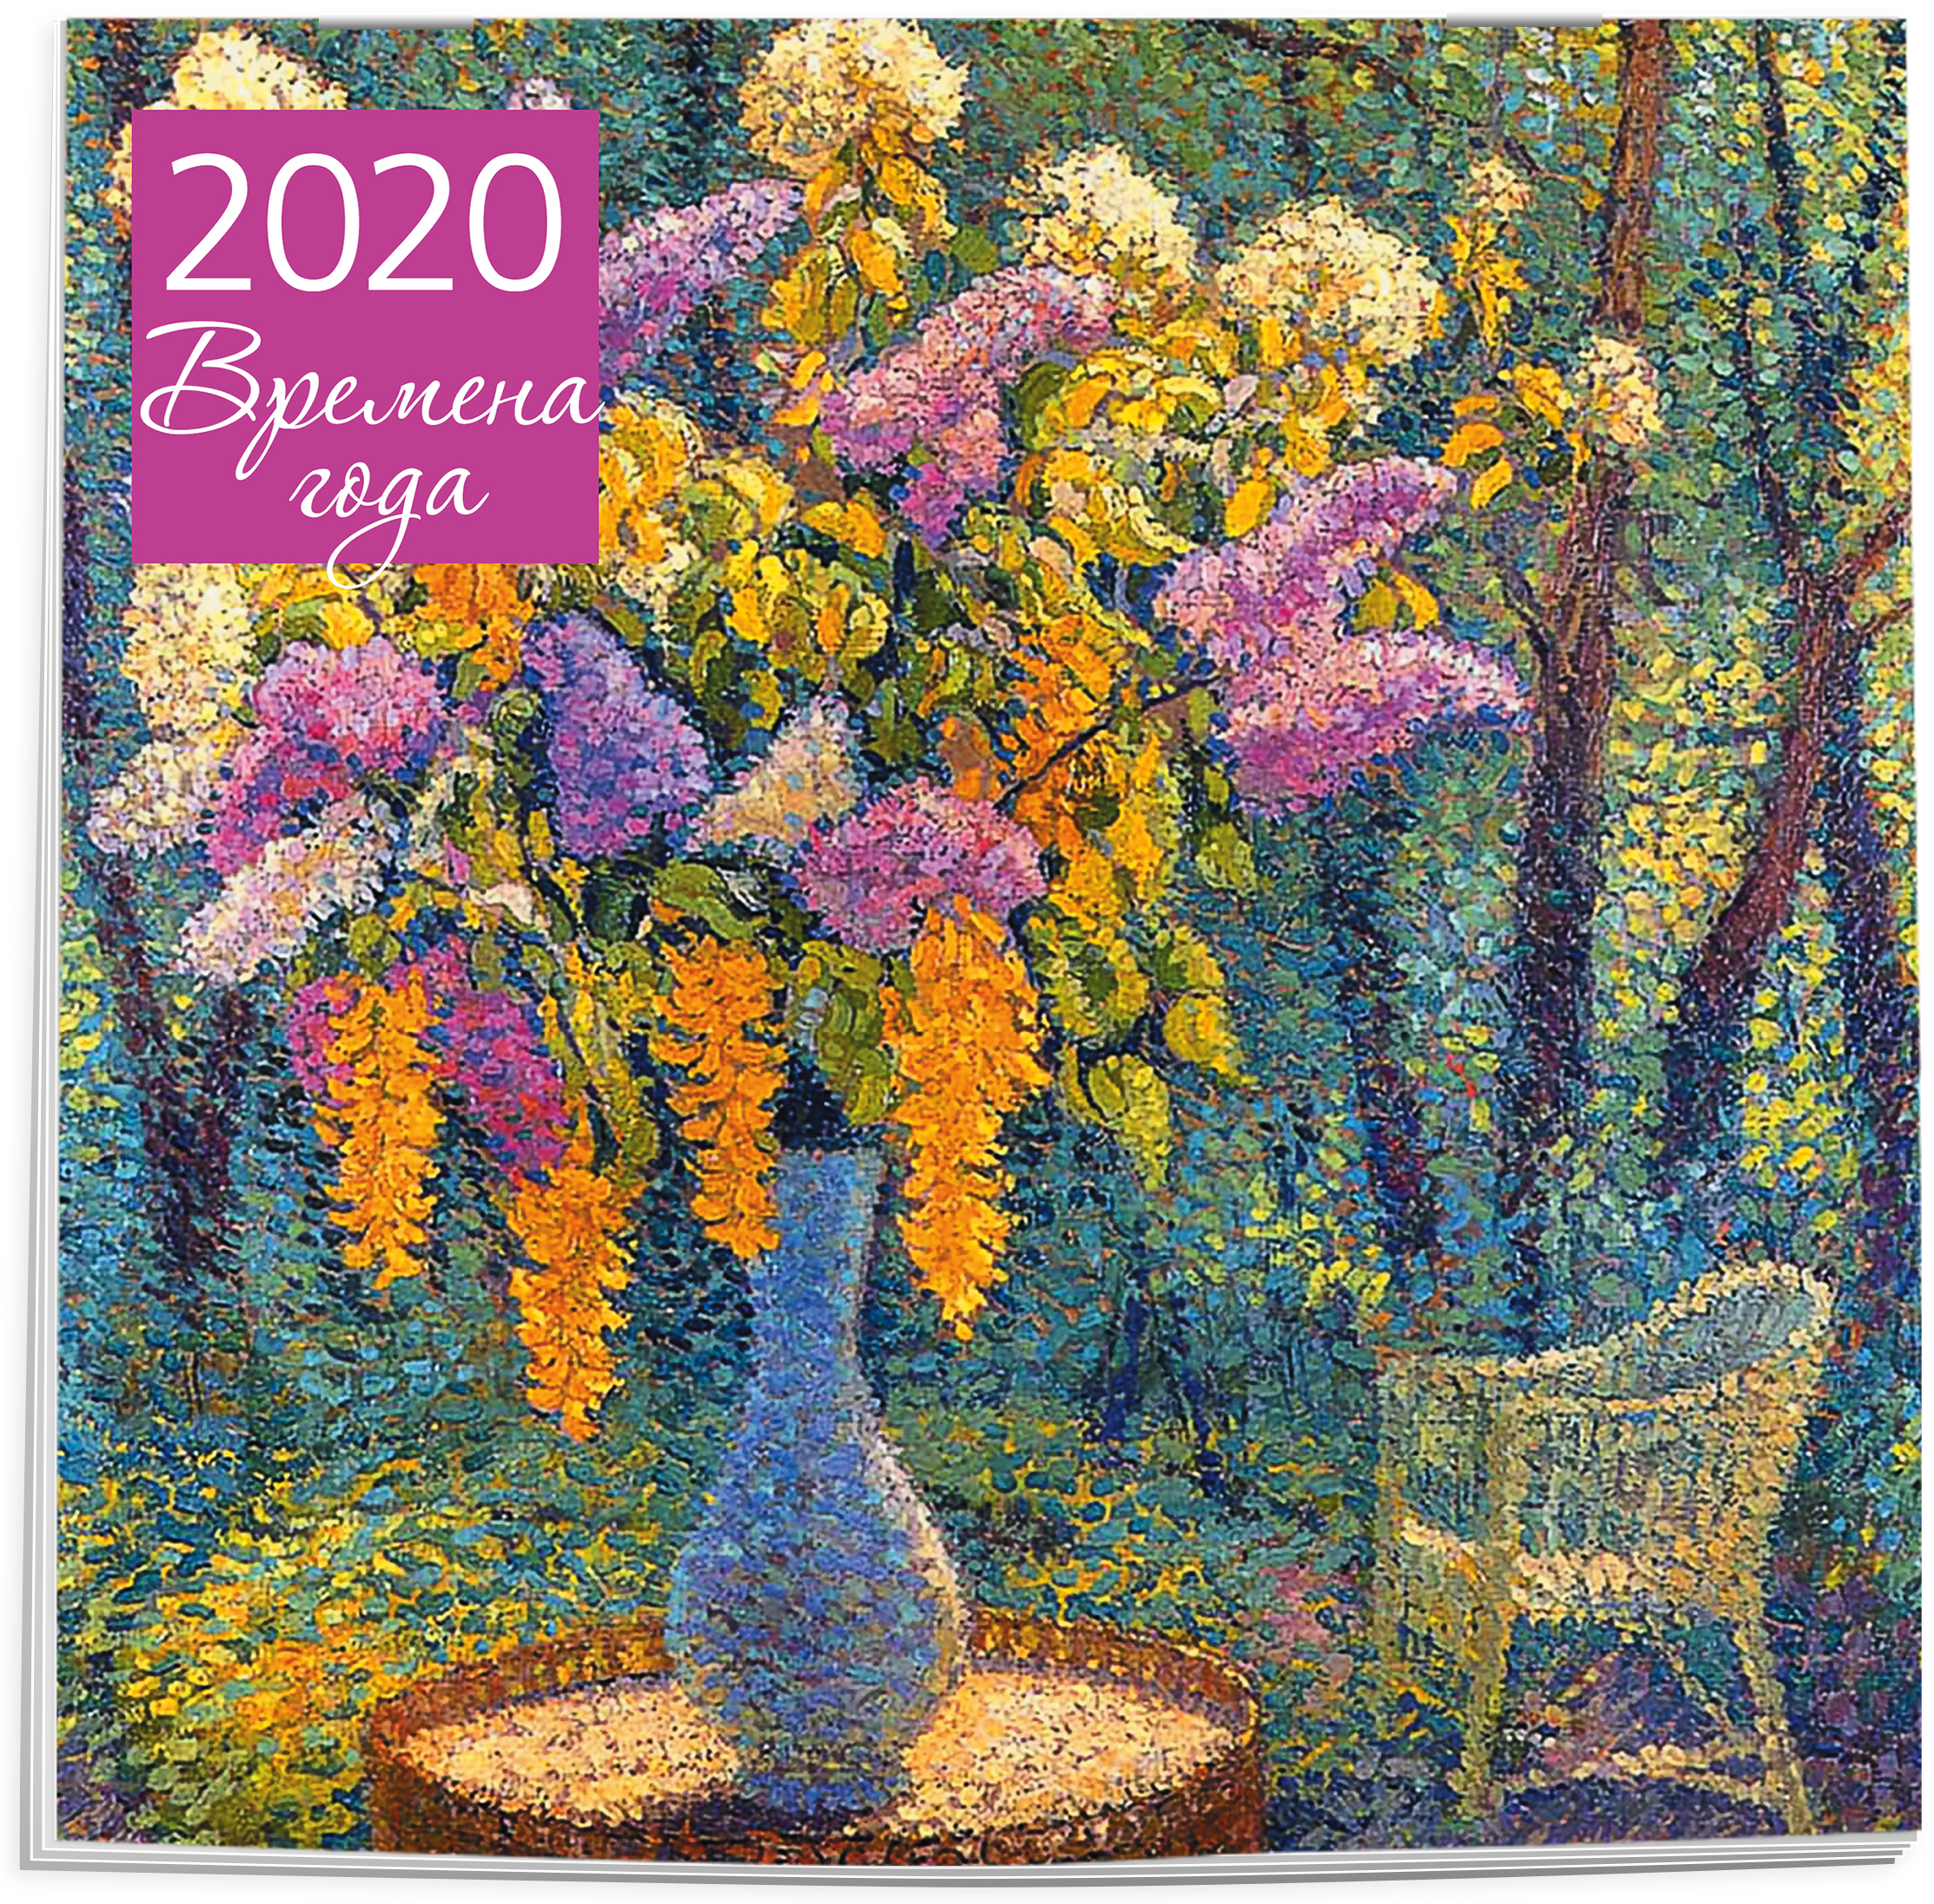 Времена года. Календарь настенный на 2020 год (300х300 мм)